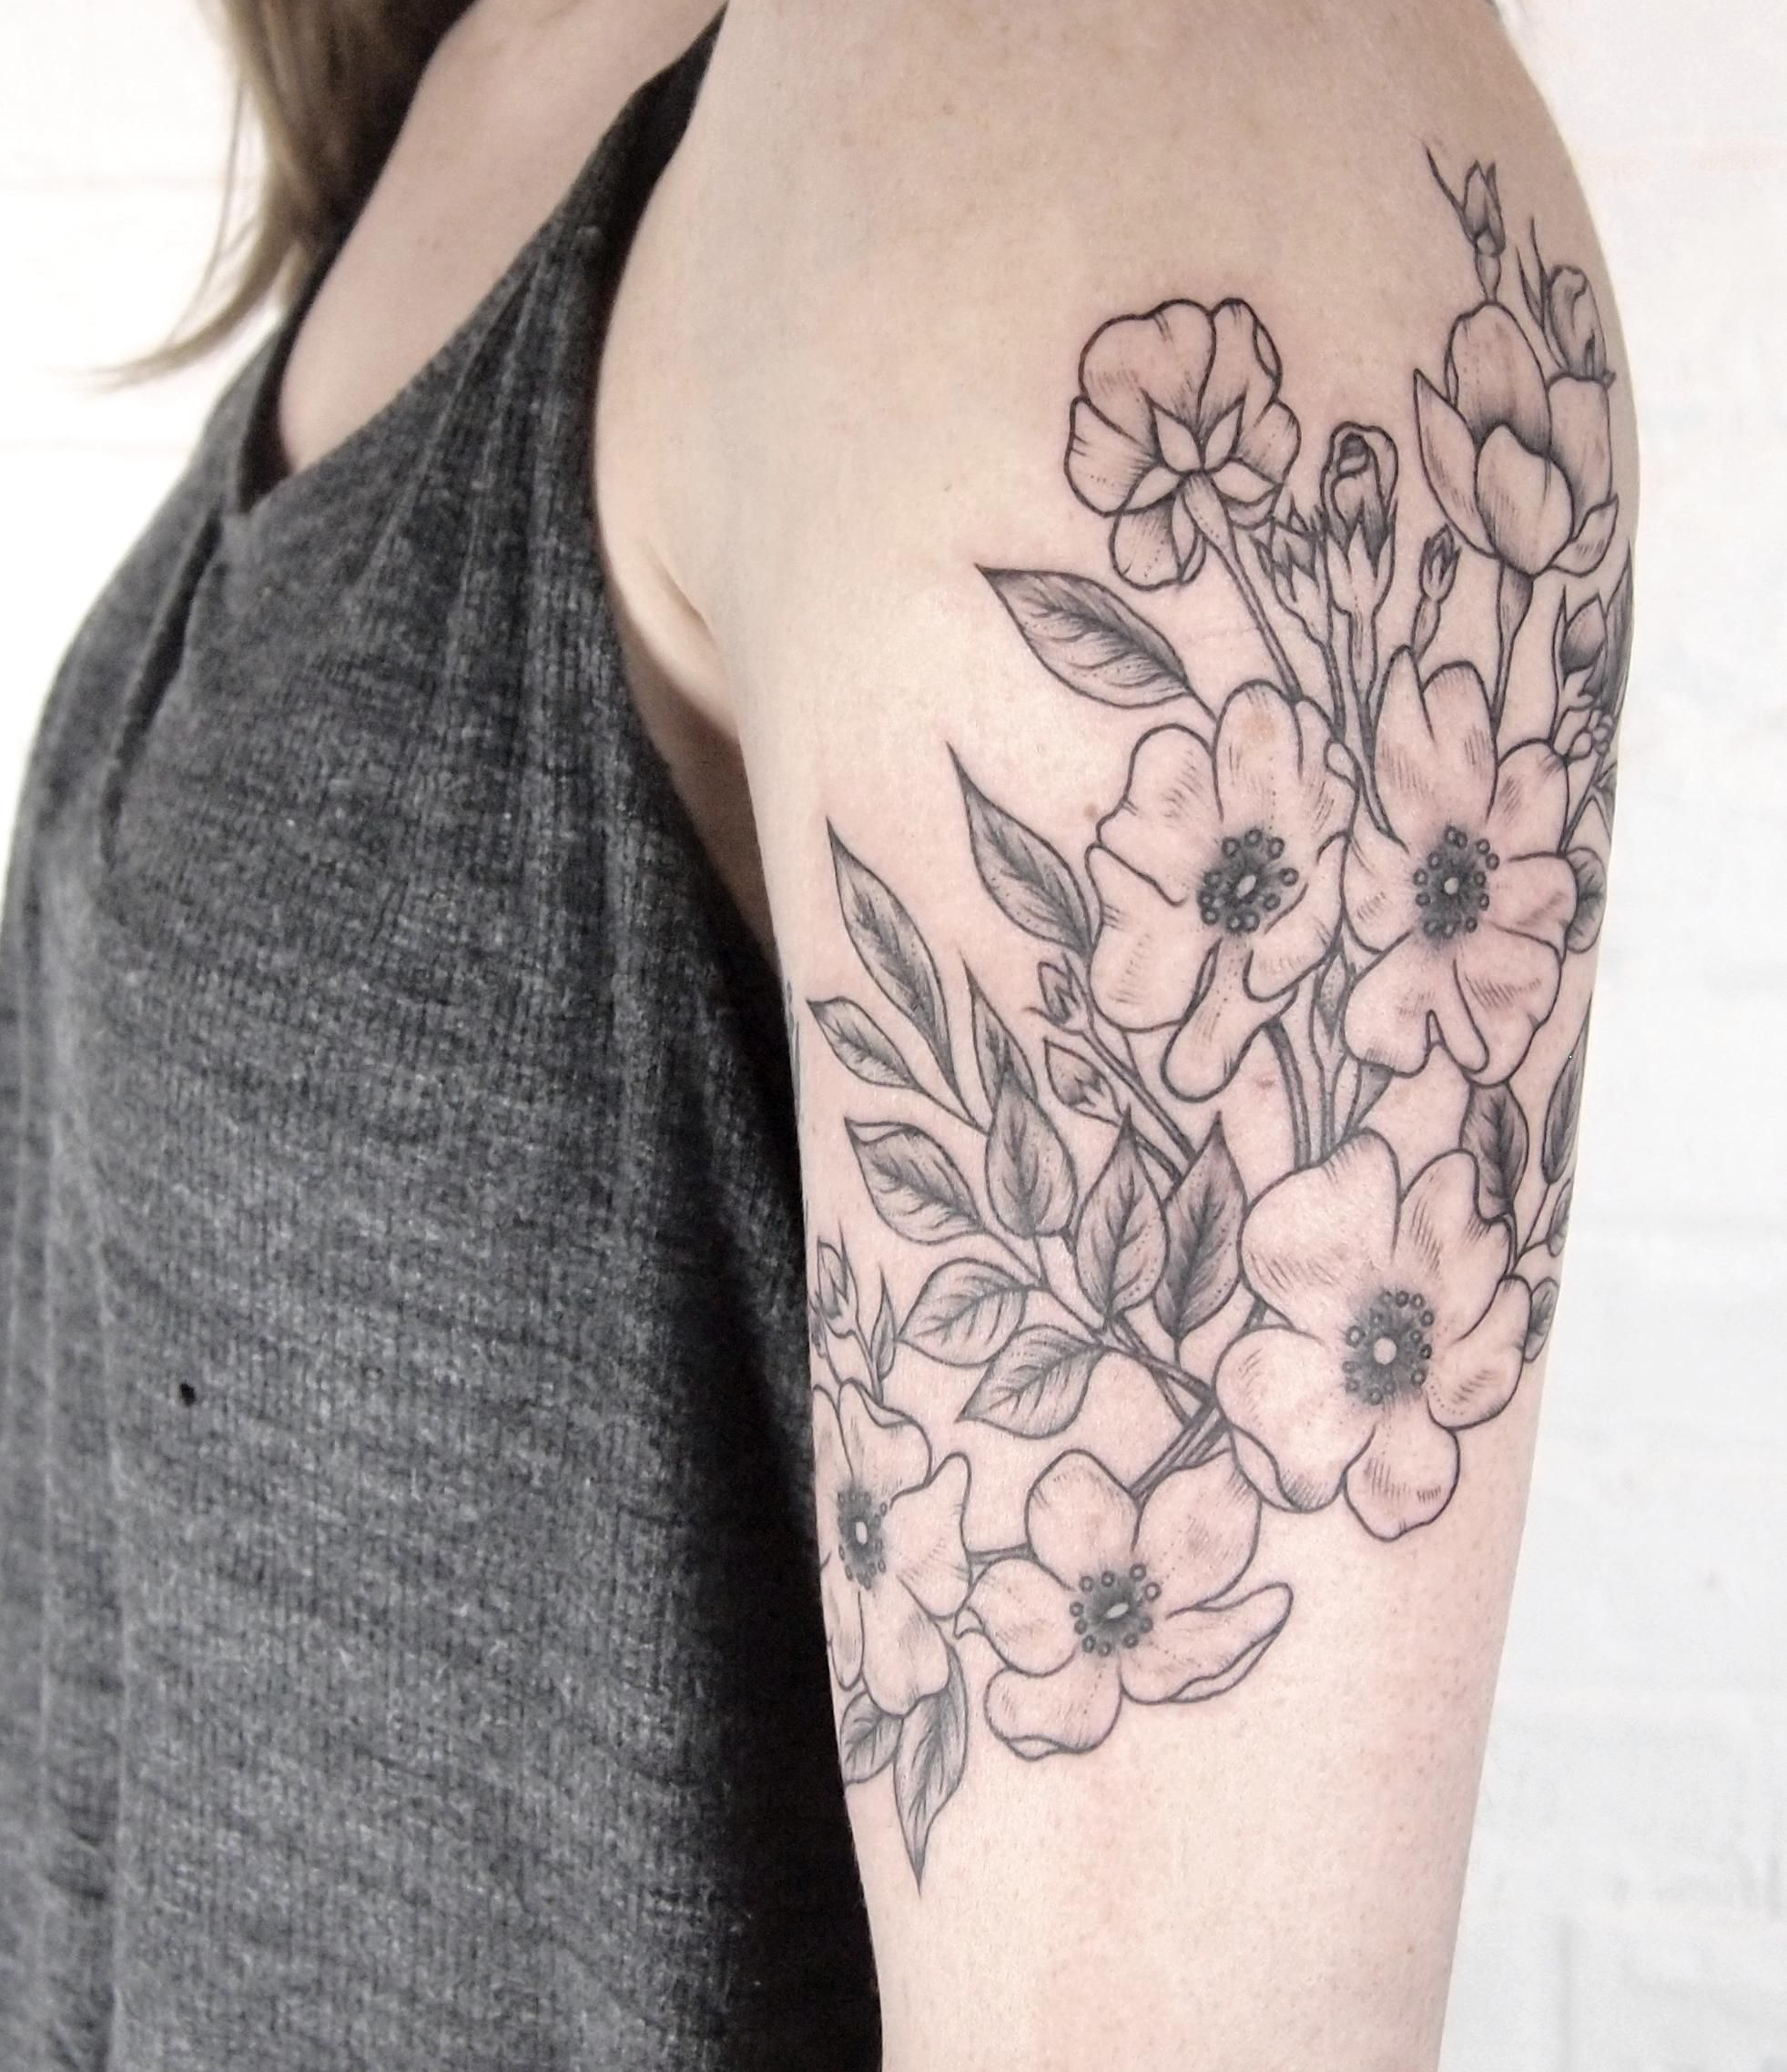 Wild roses wrapping around arm tattoo people toronto for Tattoo around arm